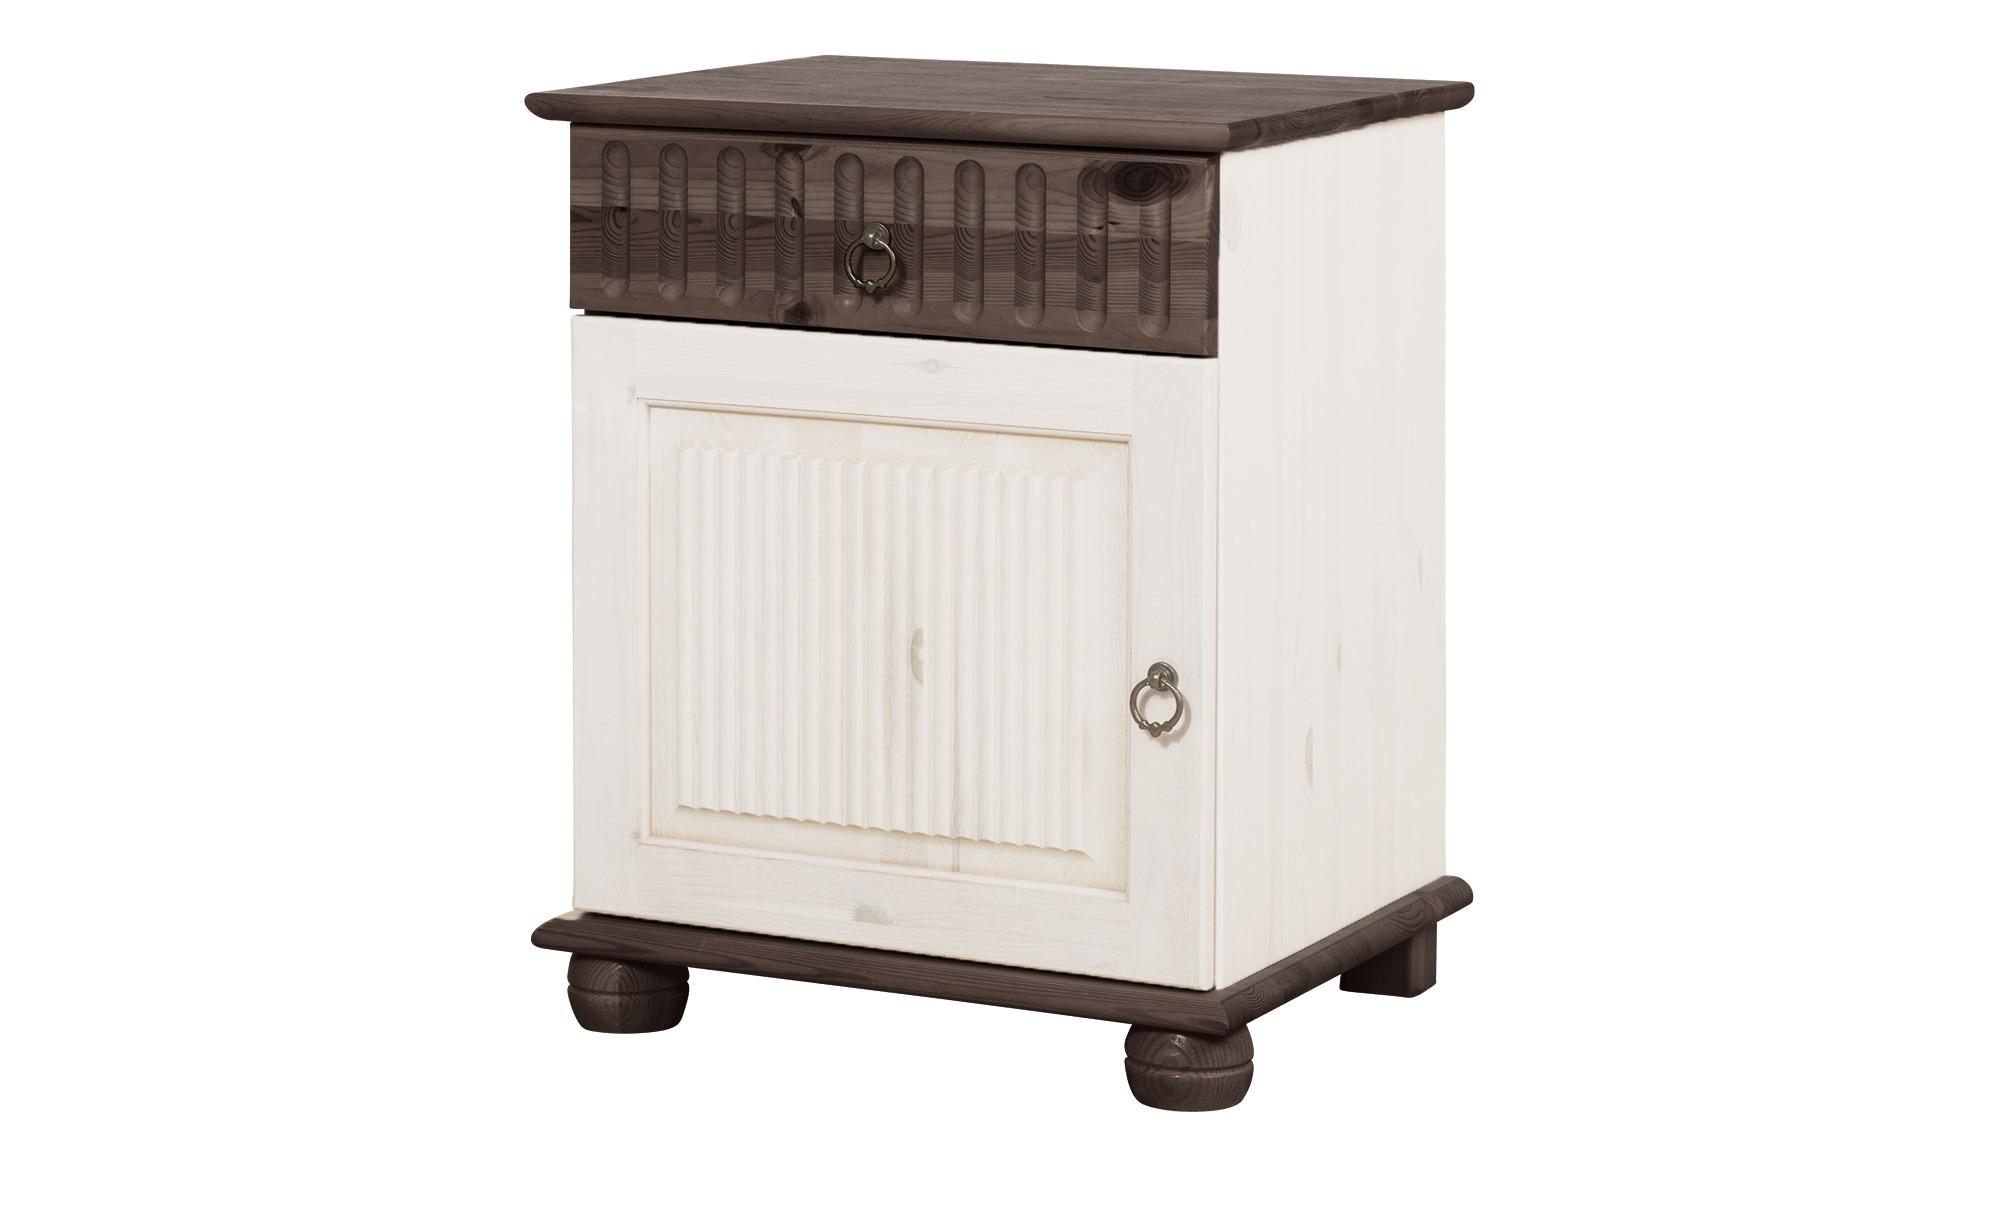 Nachtkommode - weiß - 48 cm - 60 cm - 40 cm - Kommoden & Sideboards > Kommoden - Möbel Kraft | Schlafzimmer > Kommoden | Möbel Kraft